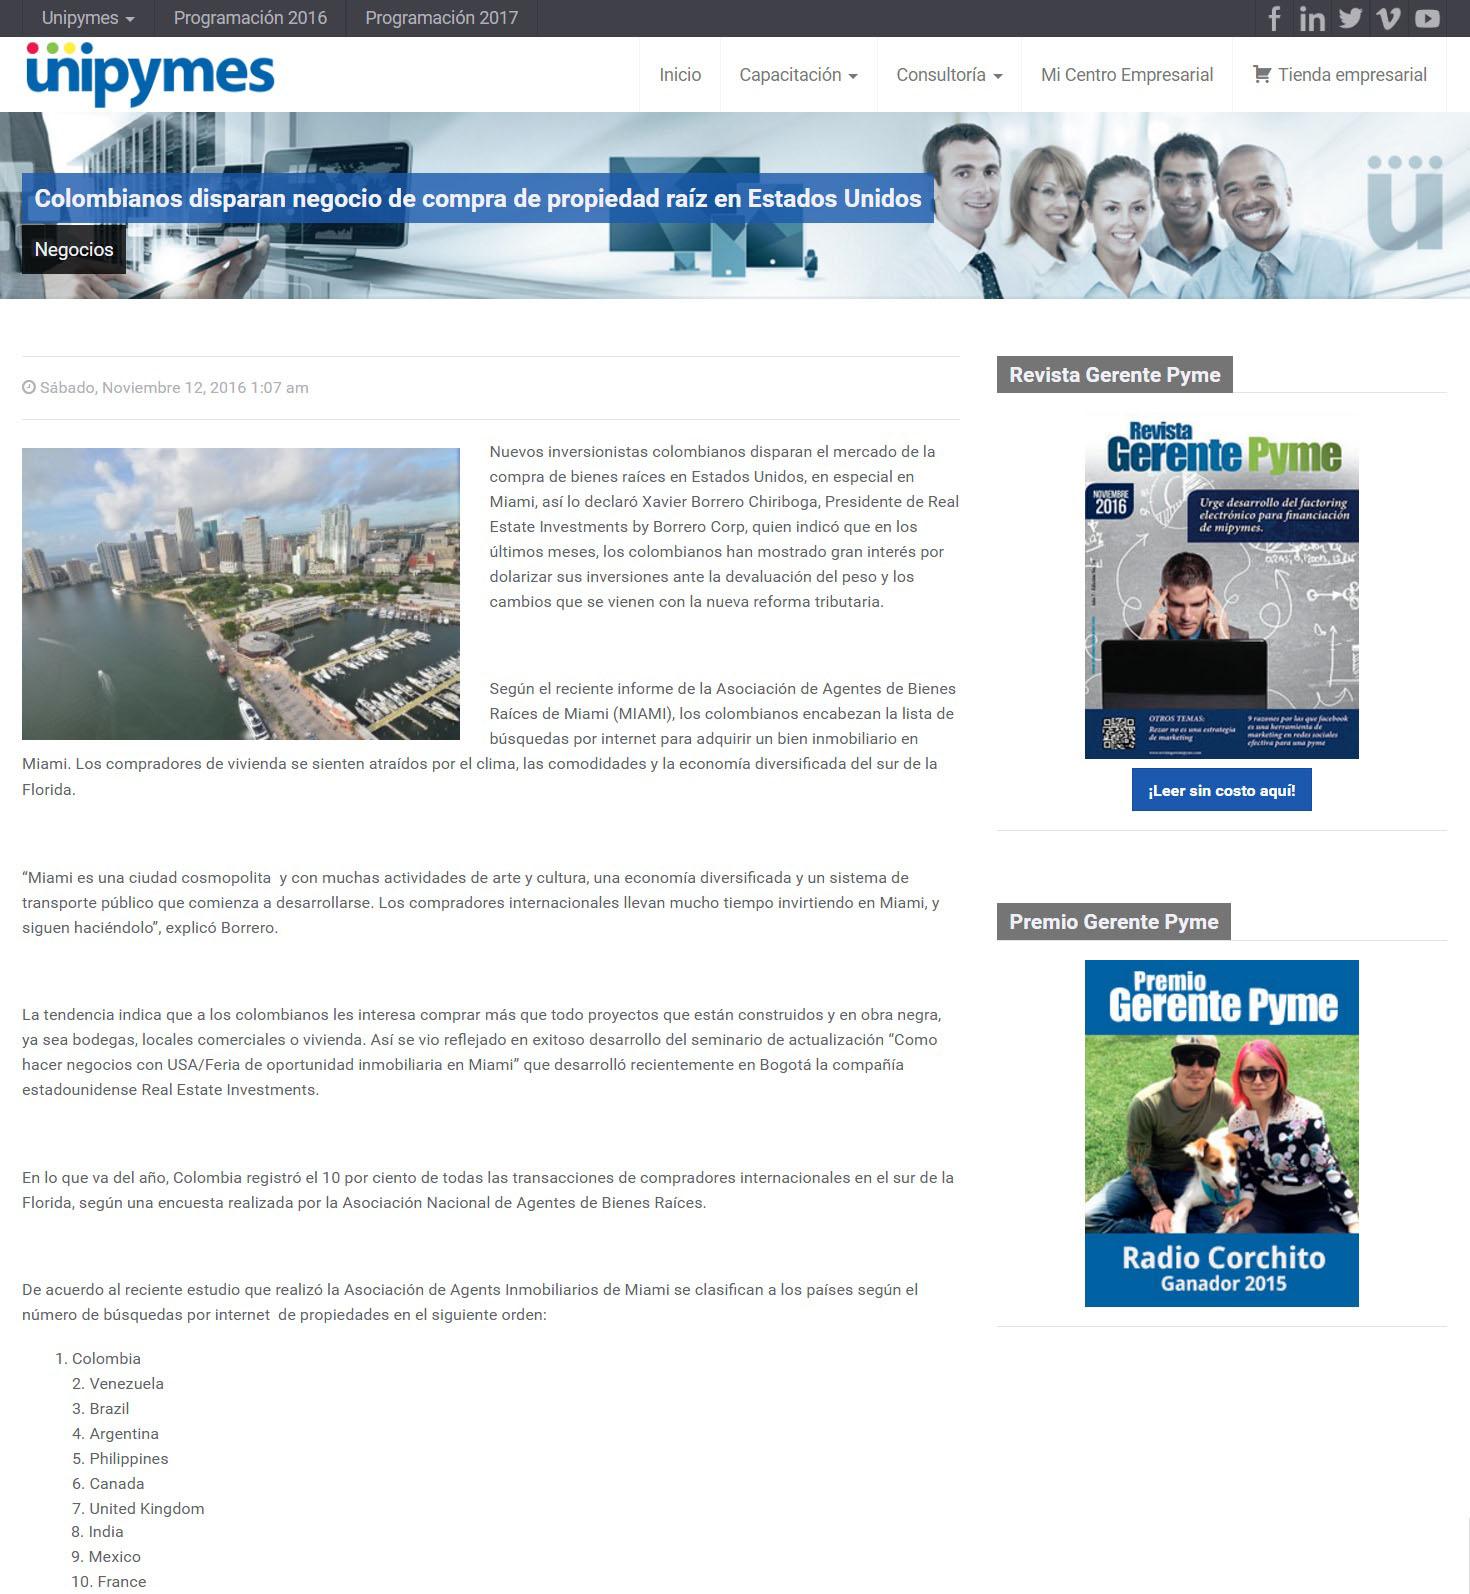 Unipymes 12 de Noviembre de 2016 [web]